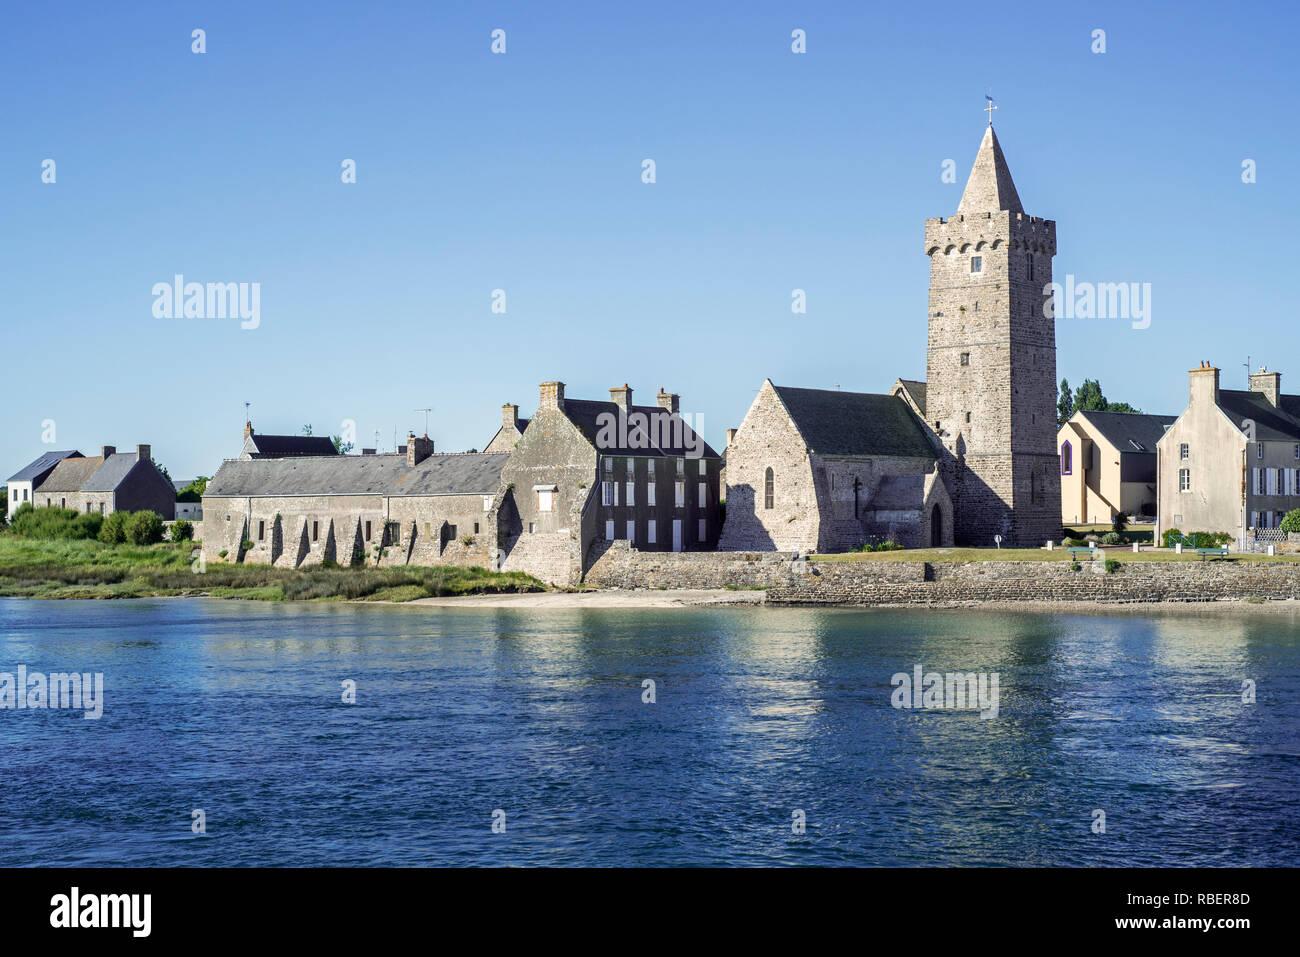 Église Notre-Dame church at the village Portbail / Port-Bail, Manche, Normandy, France - Stock Image